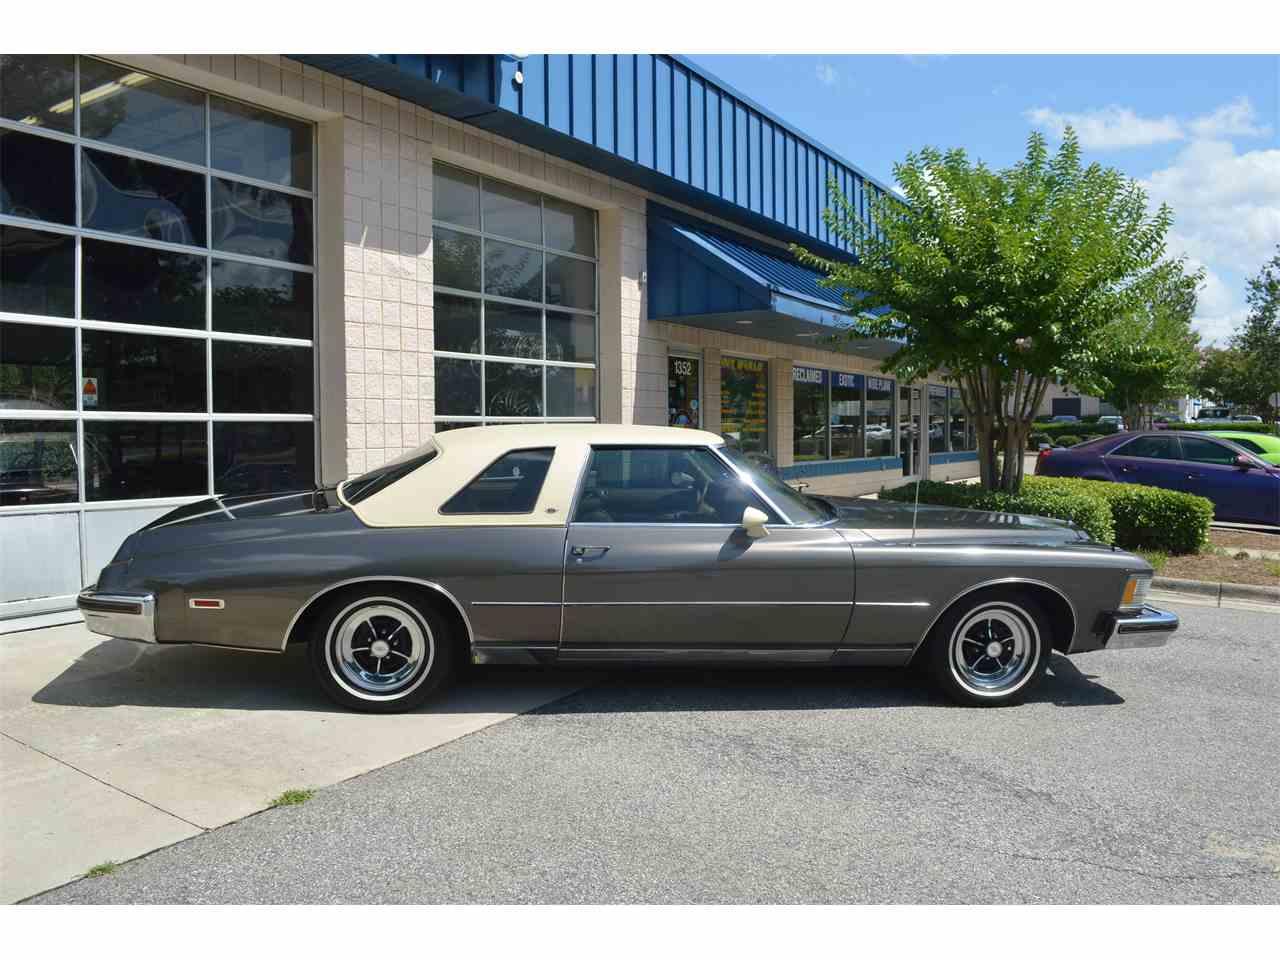 1974 Buick Riviera For Sale Classiccars Com Cc 999937